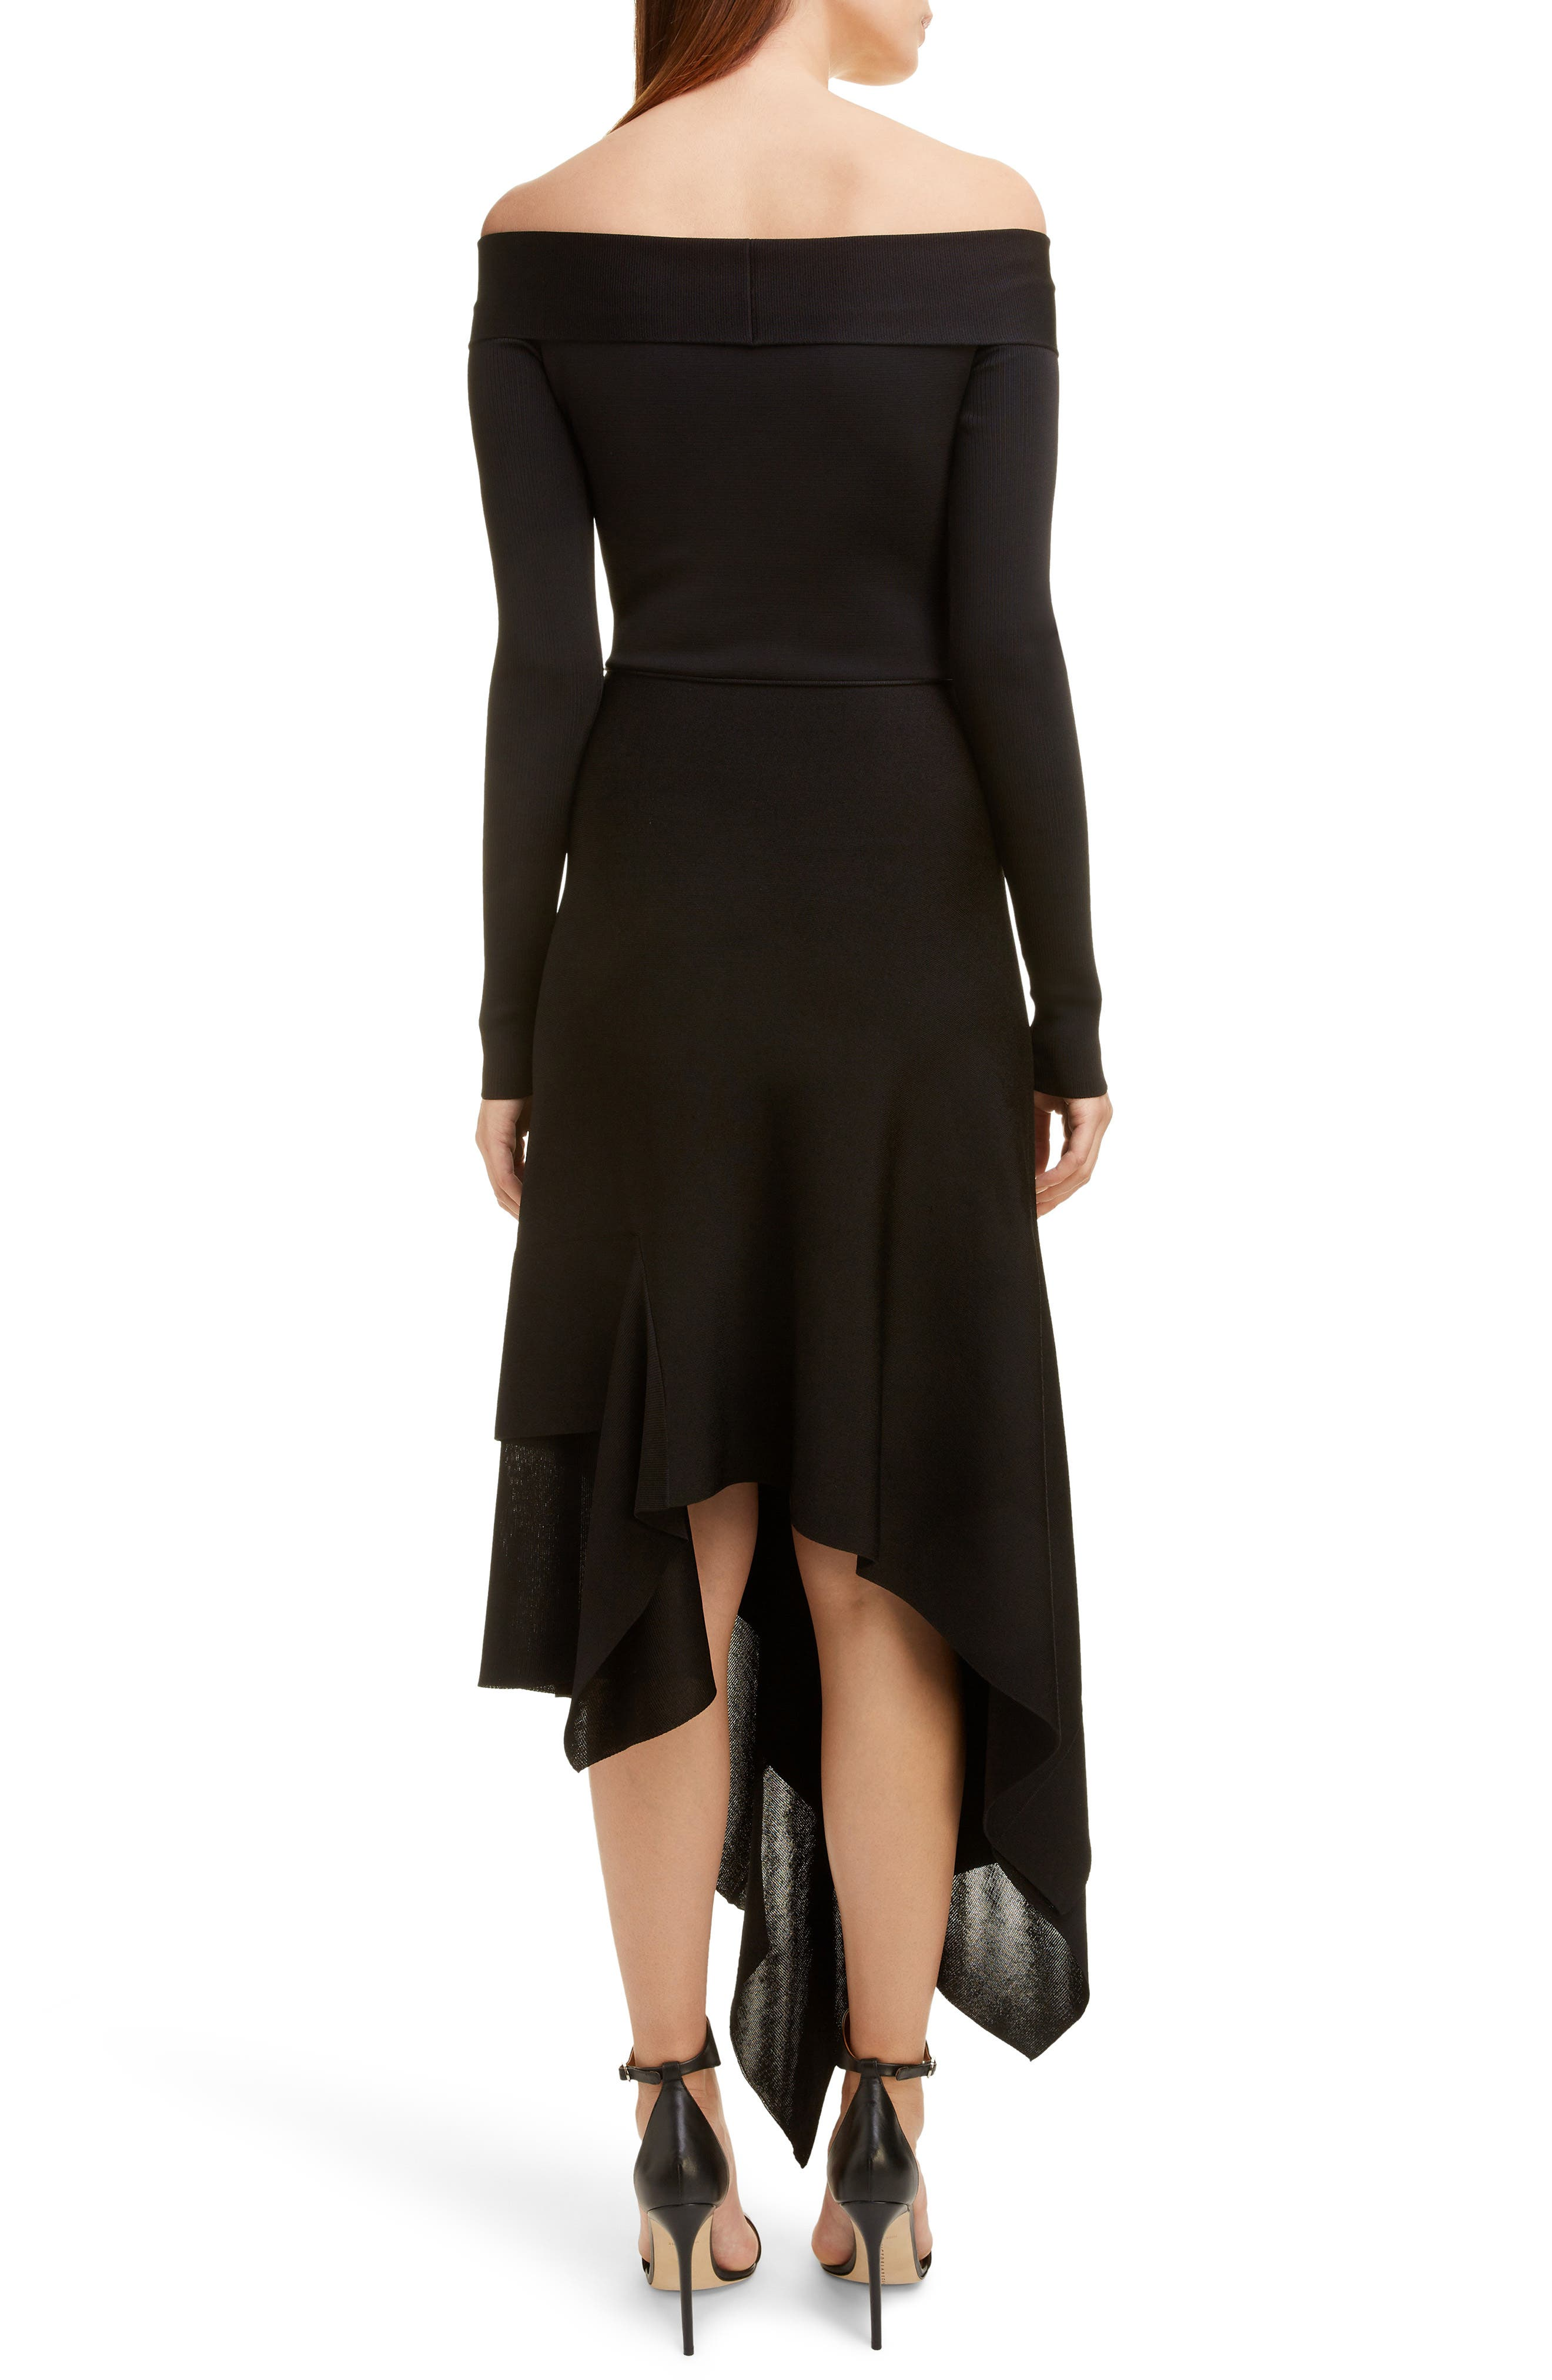 VICTORIA BECKHAM, Long Sleeve Off the Shoulder Asymmetrical Dress, Alternate thumbnail 2, color, BLACK